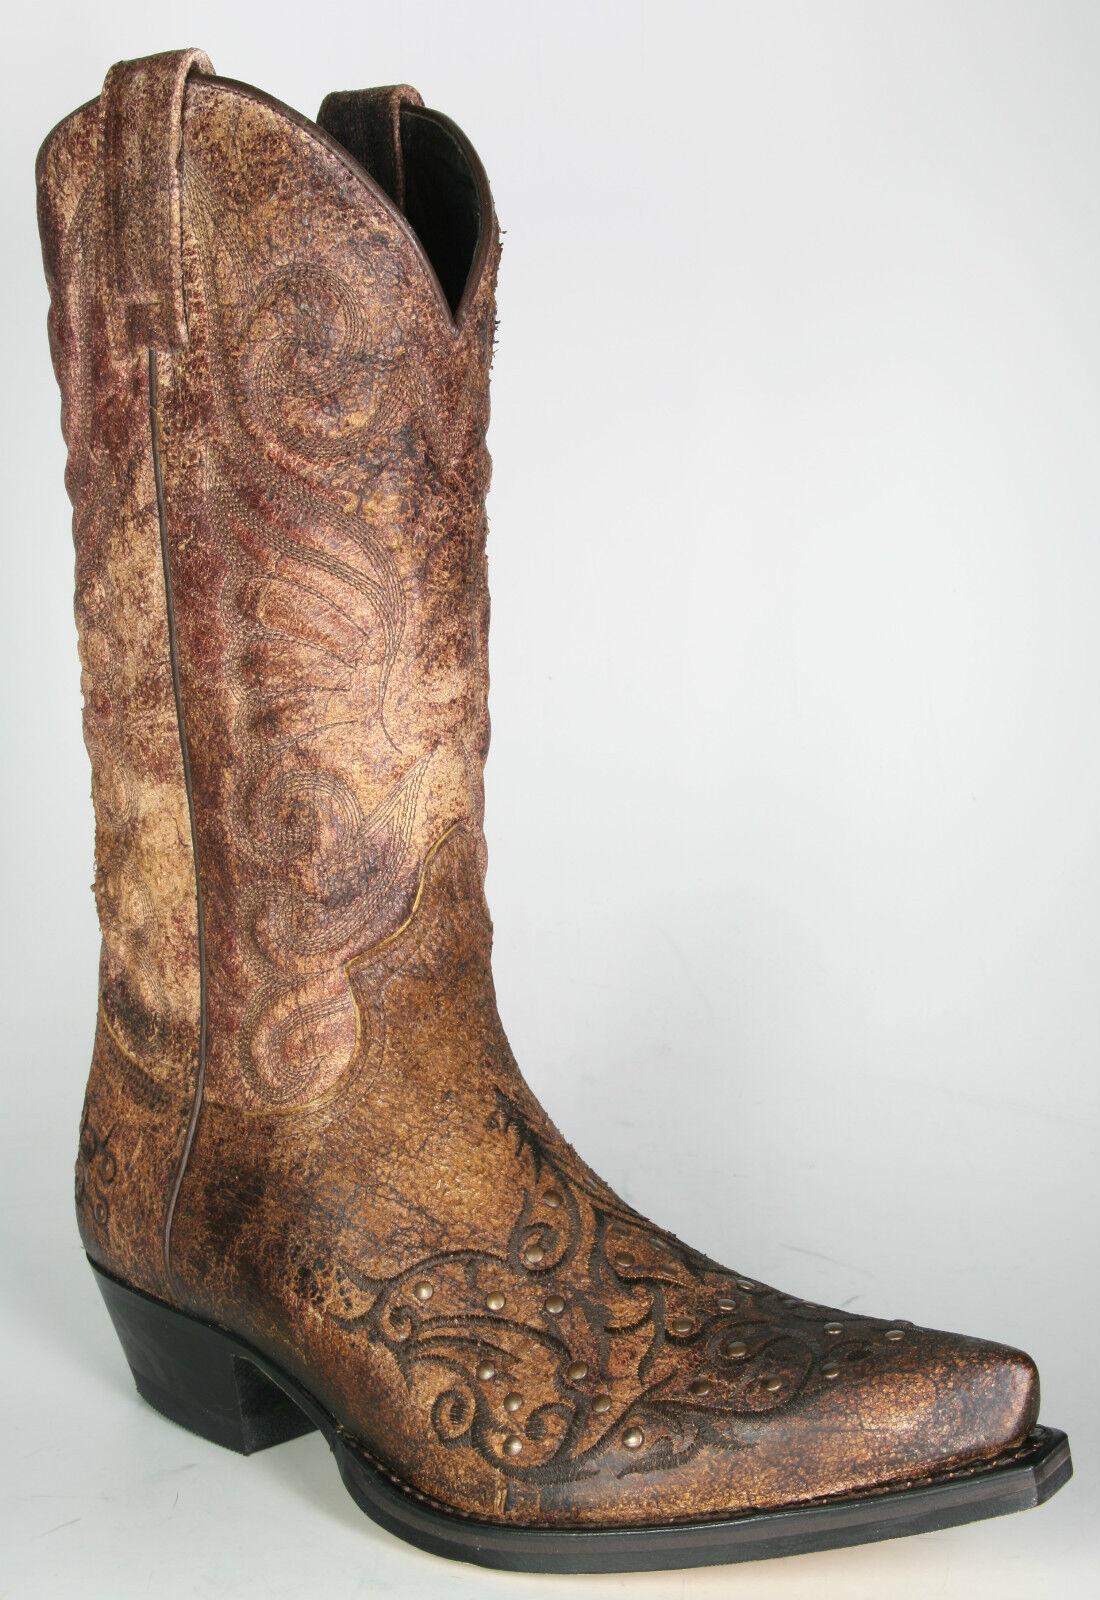 11472 Sendra Cowboystiefel Palma Cuoio Vintage-Look mit kleinen Nieten